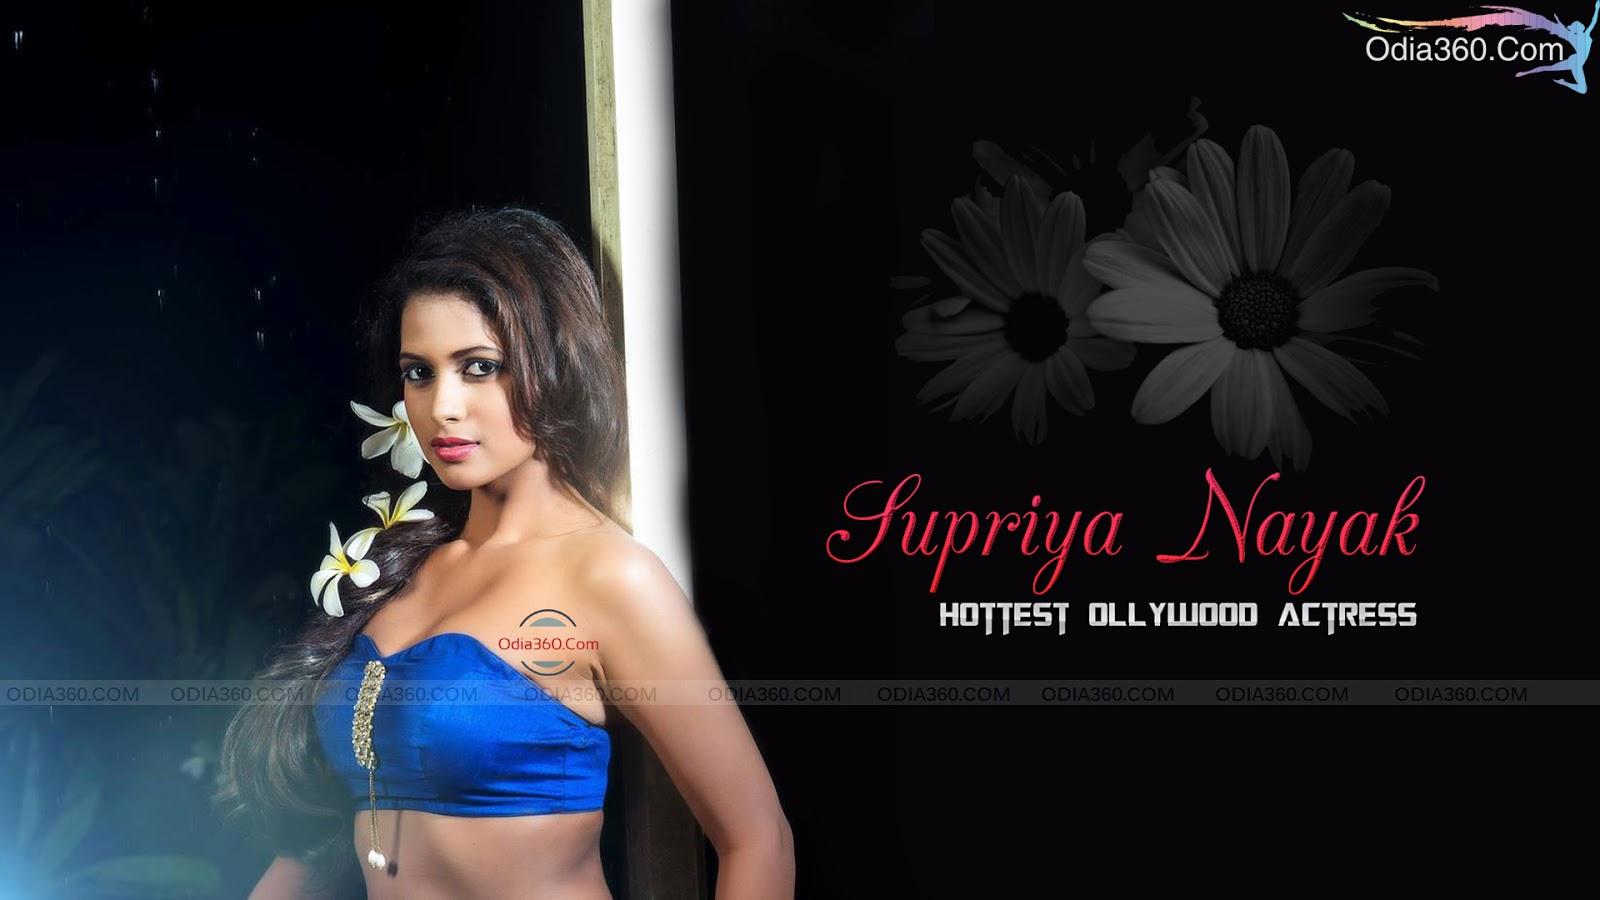 Supriya Nayak Odia Hot Sexy Actress Hd Wallpaper Download -6190